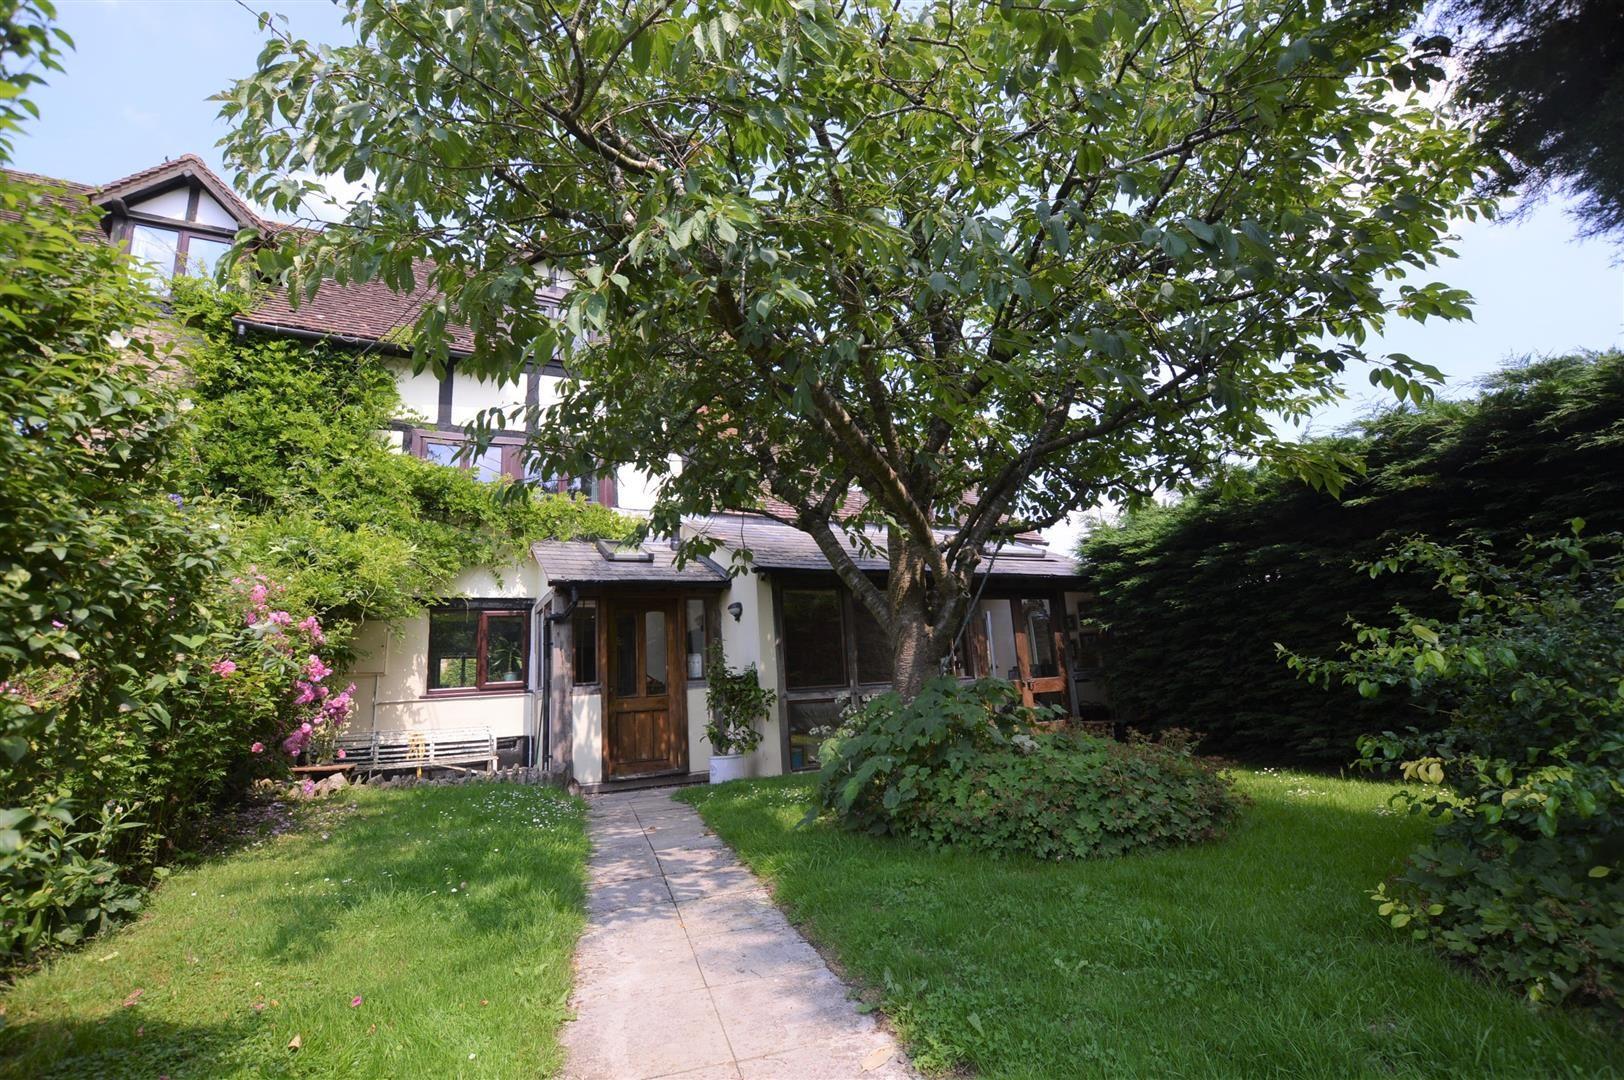 4 bed cottage for sale in Bircher, HR6